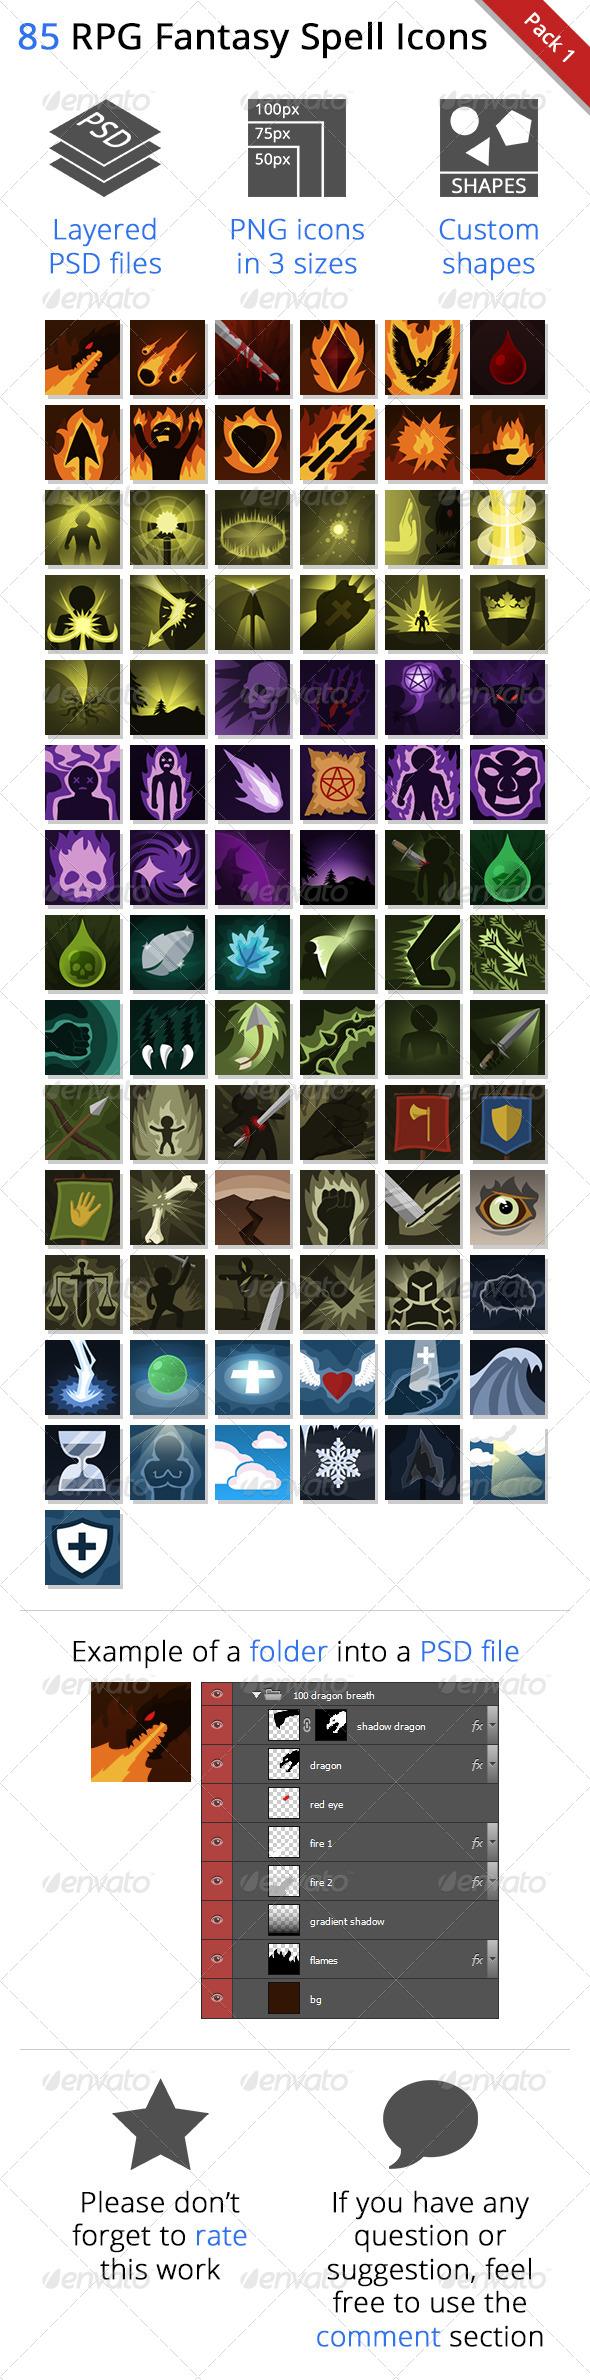 85 RPG Fantasy Spells Icons - Icons